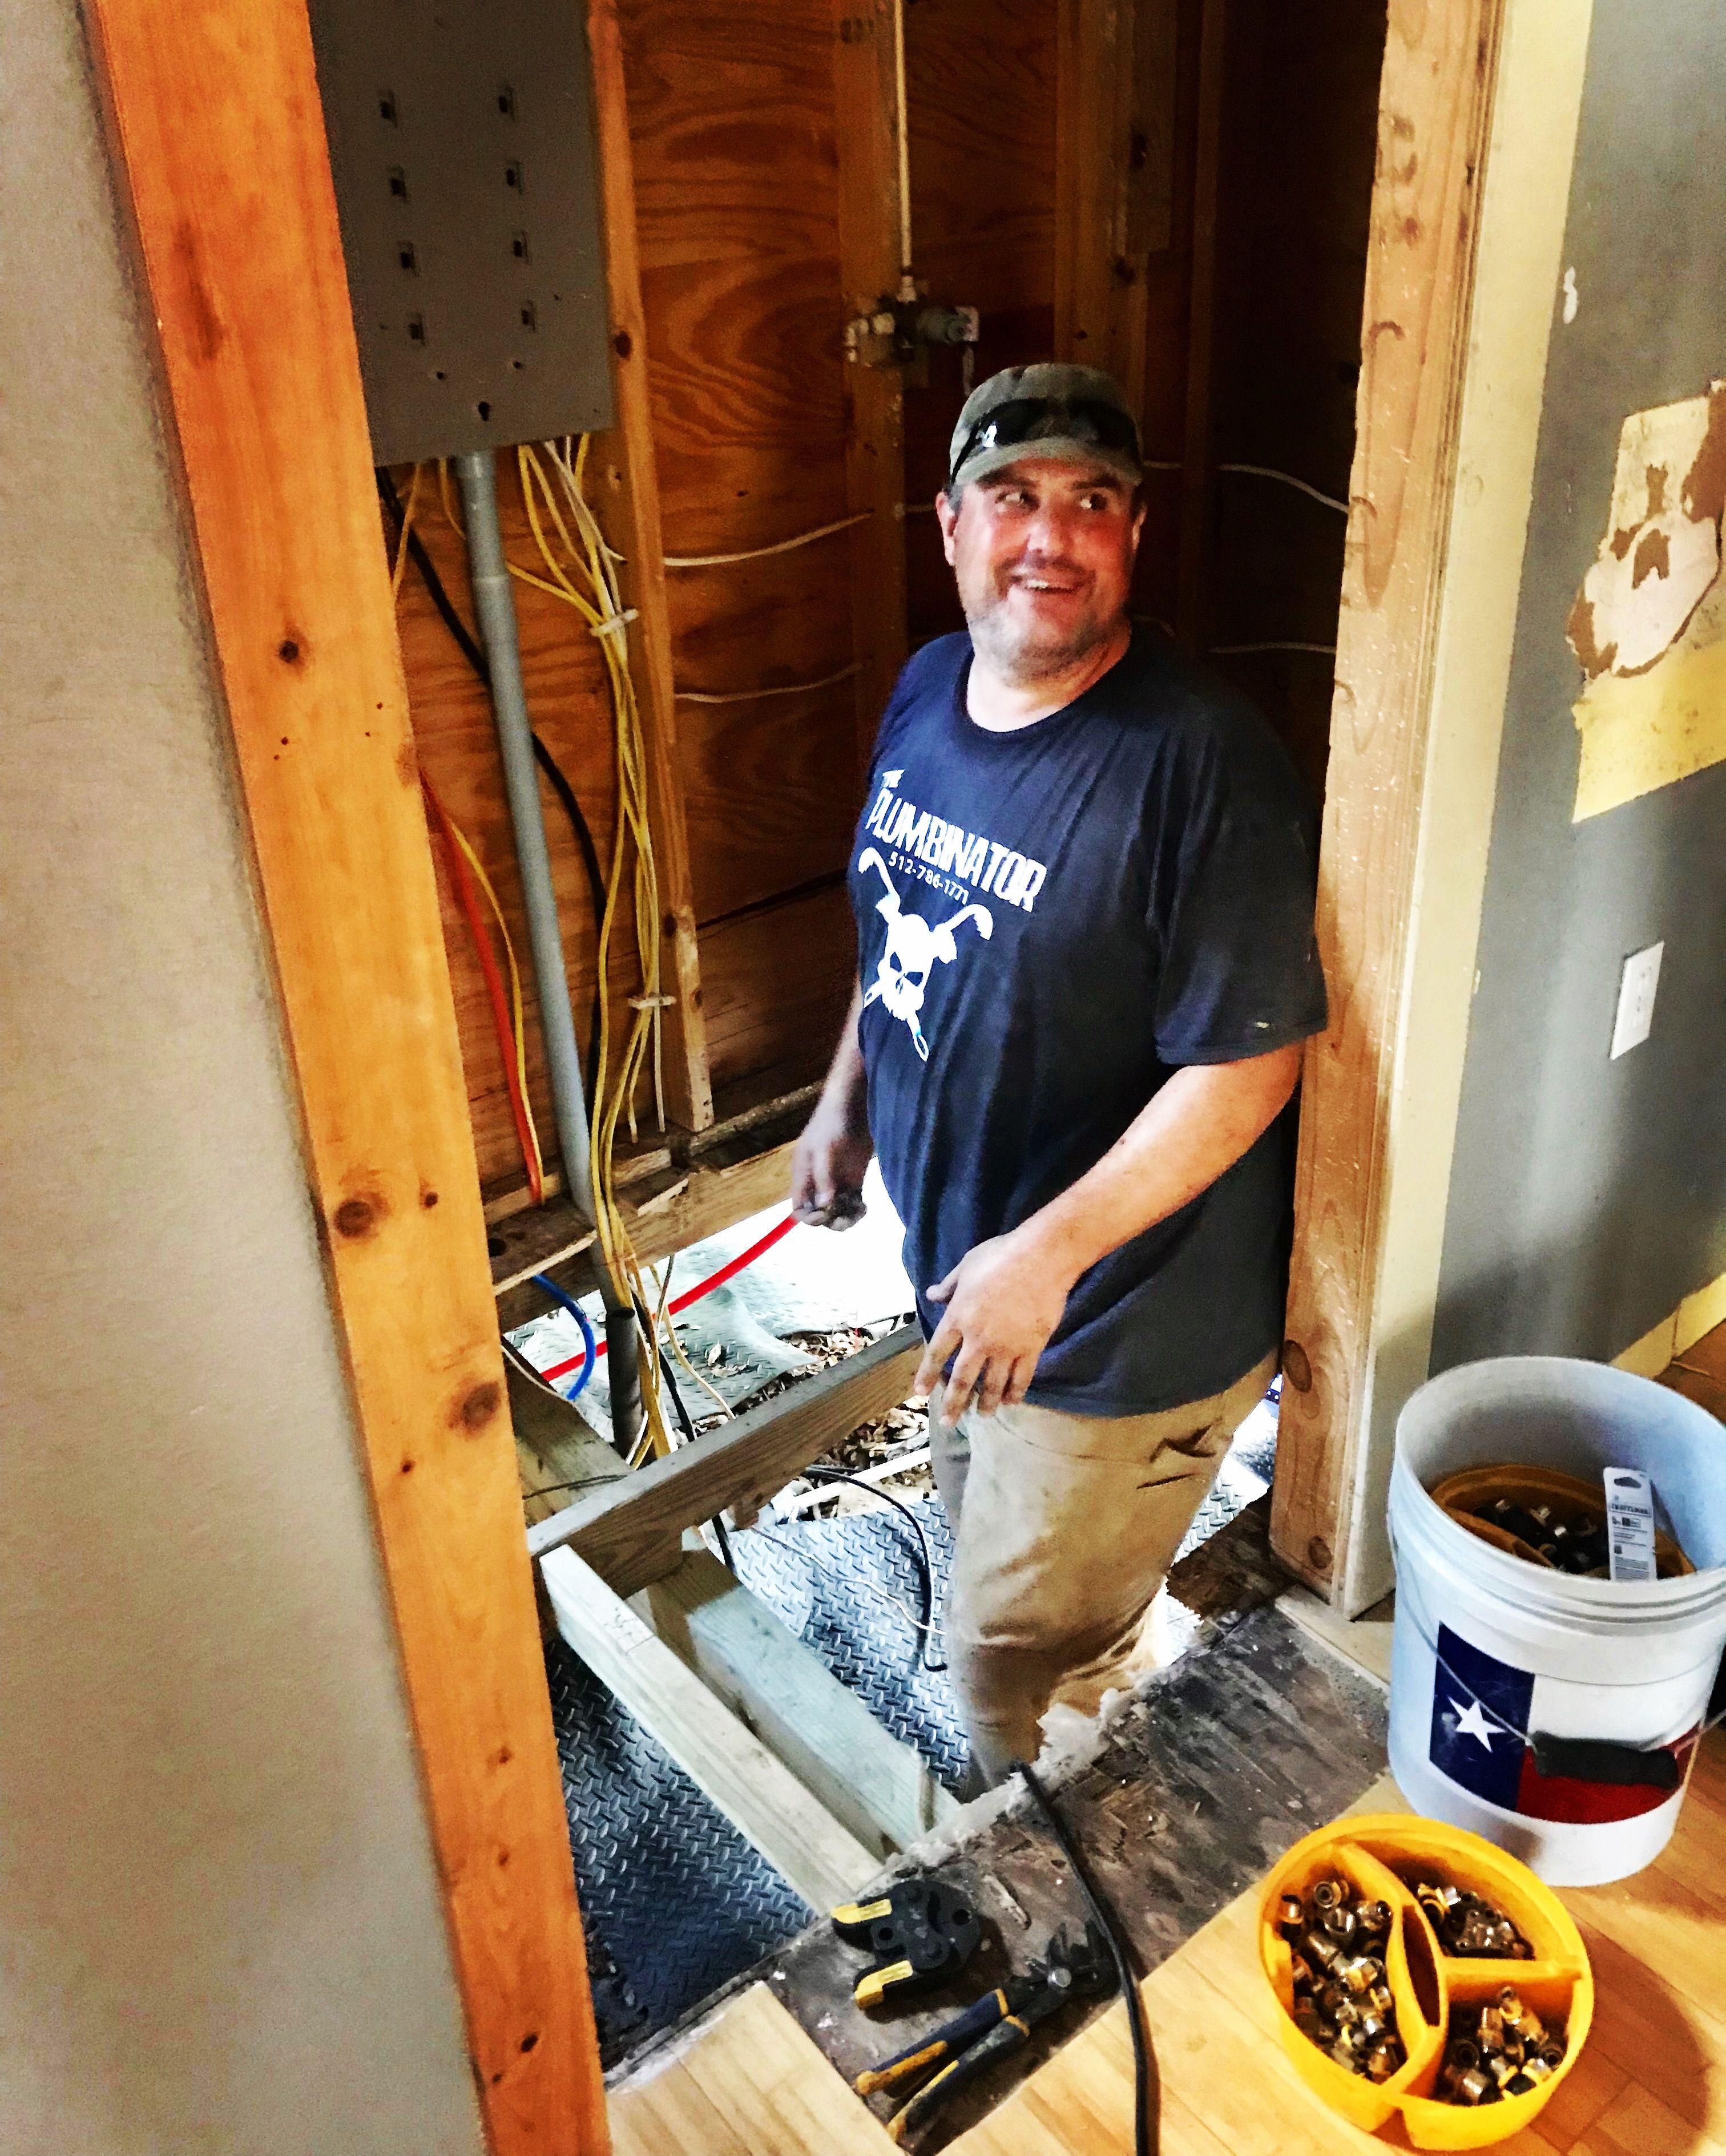 Plumbing Apprentice Shad Is Most Happy When He S Downinahole D Plumbing Plumber Atx Plumbing Local Plumbers Plumber